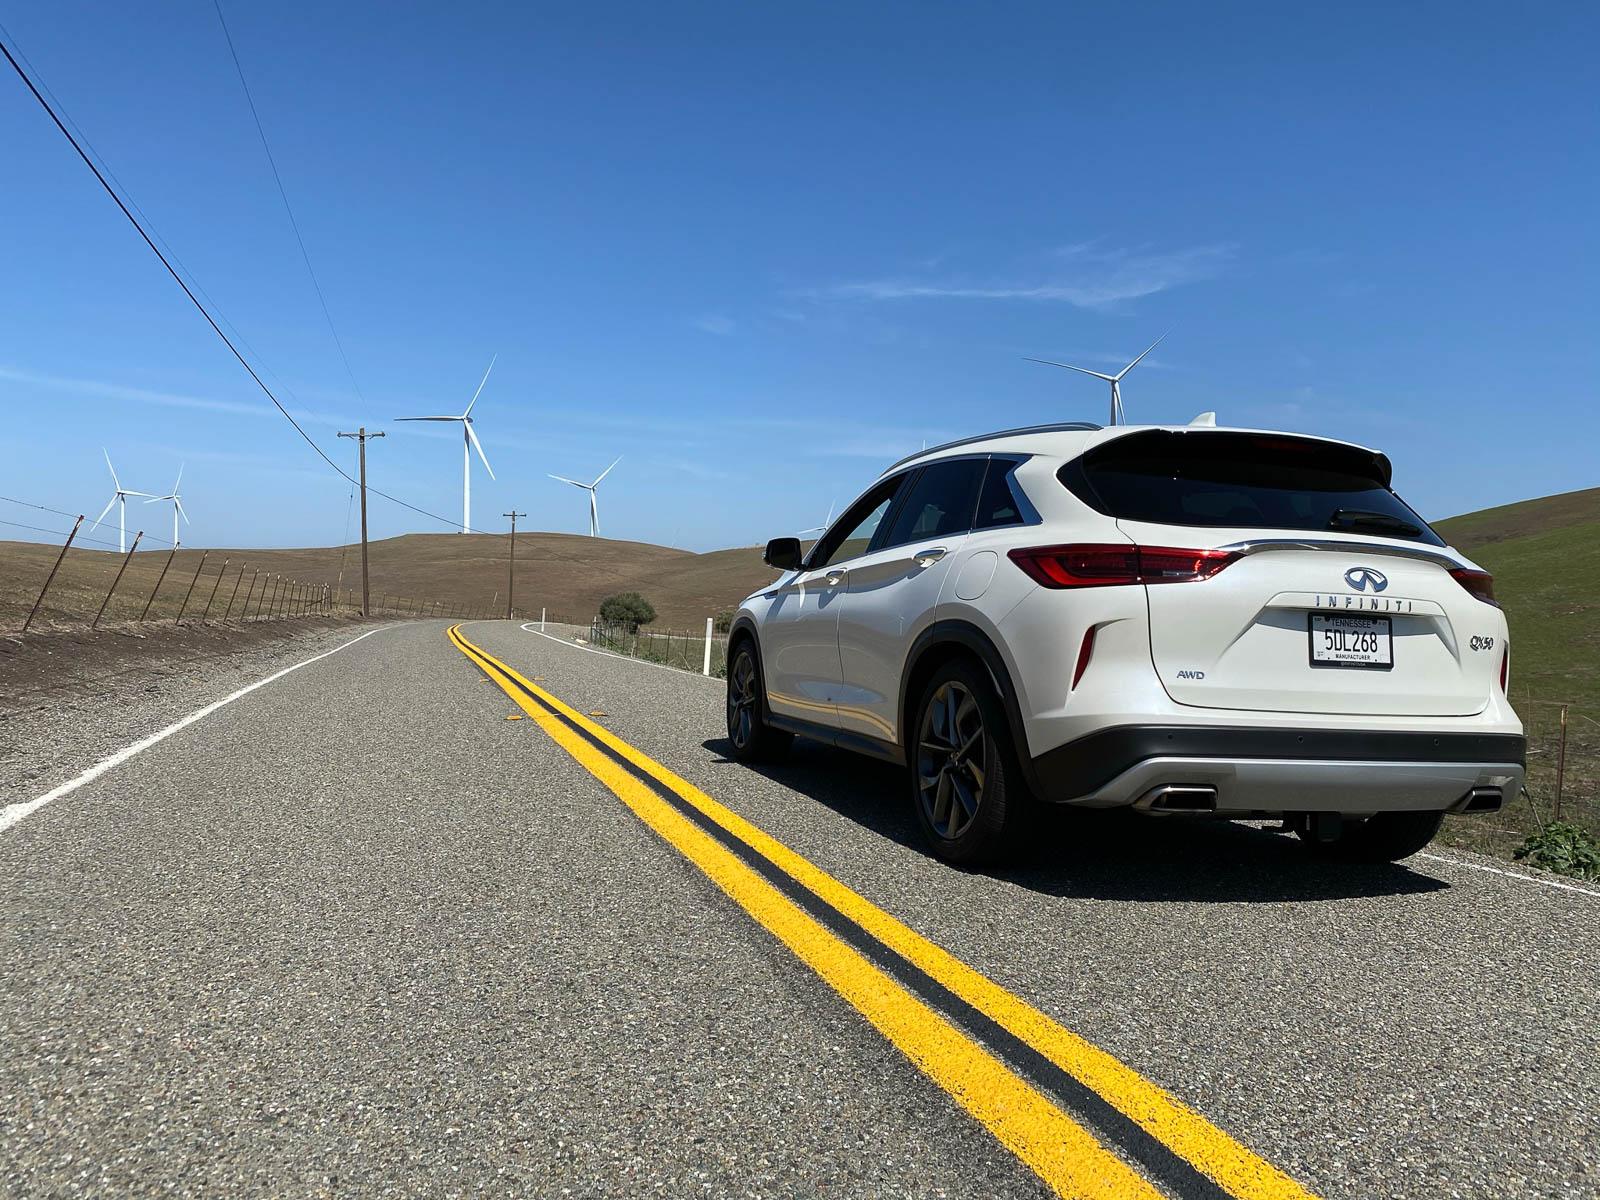 2021 Infiniti QX50 rear view